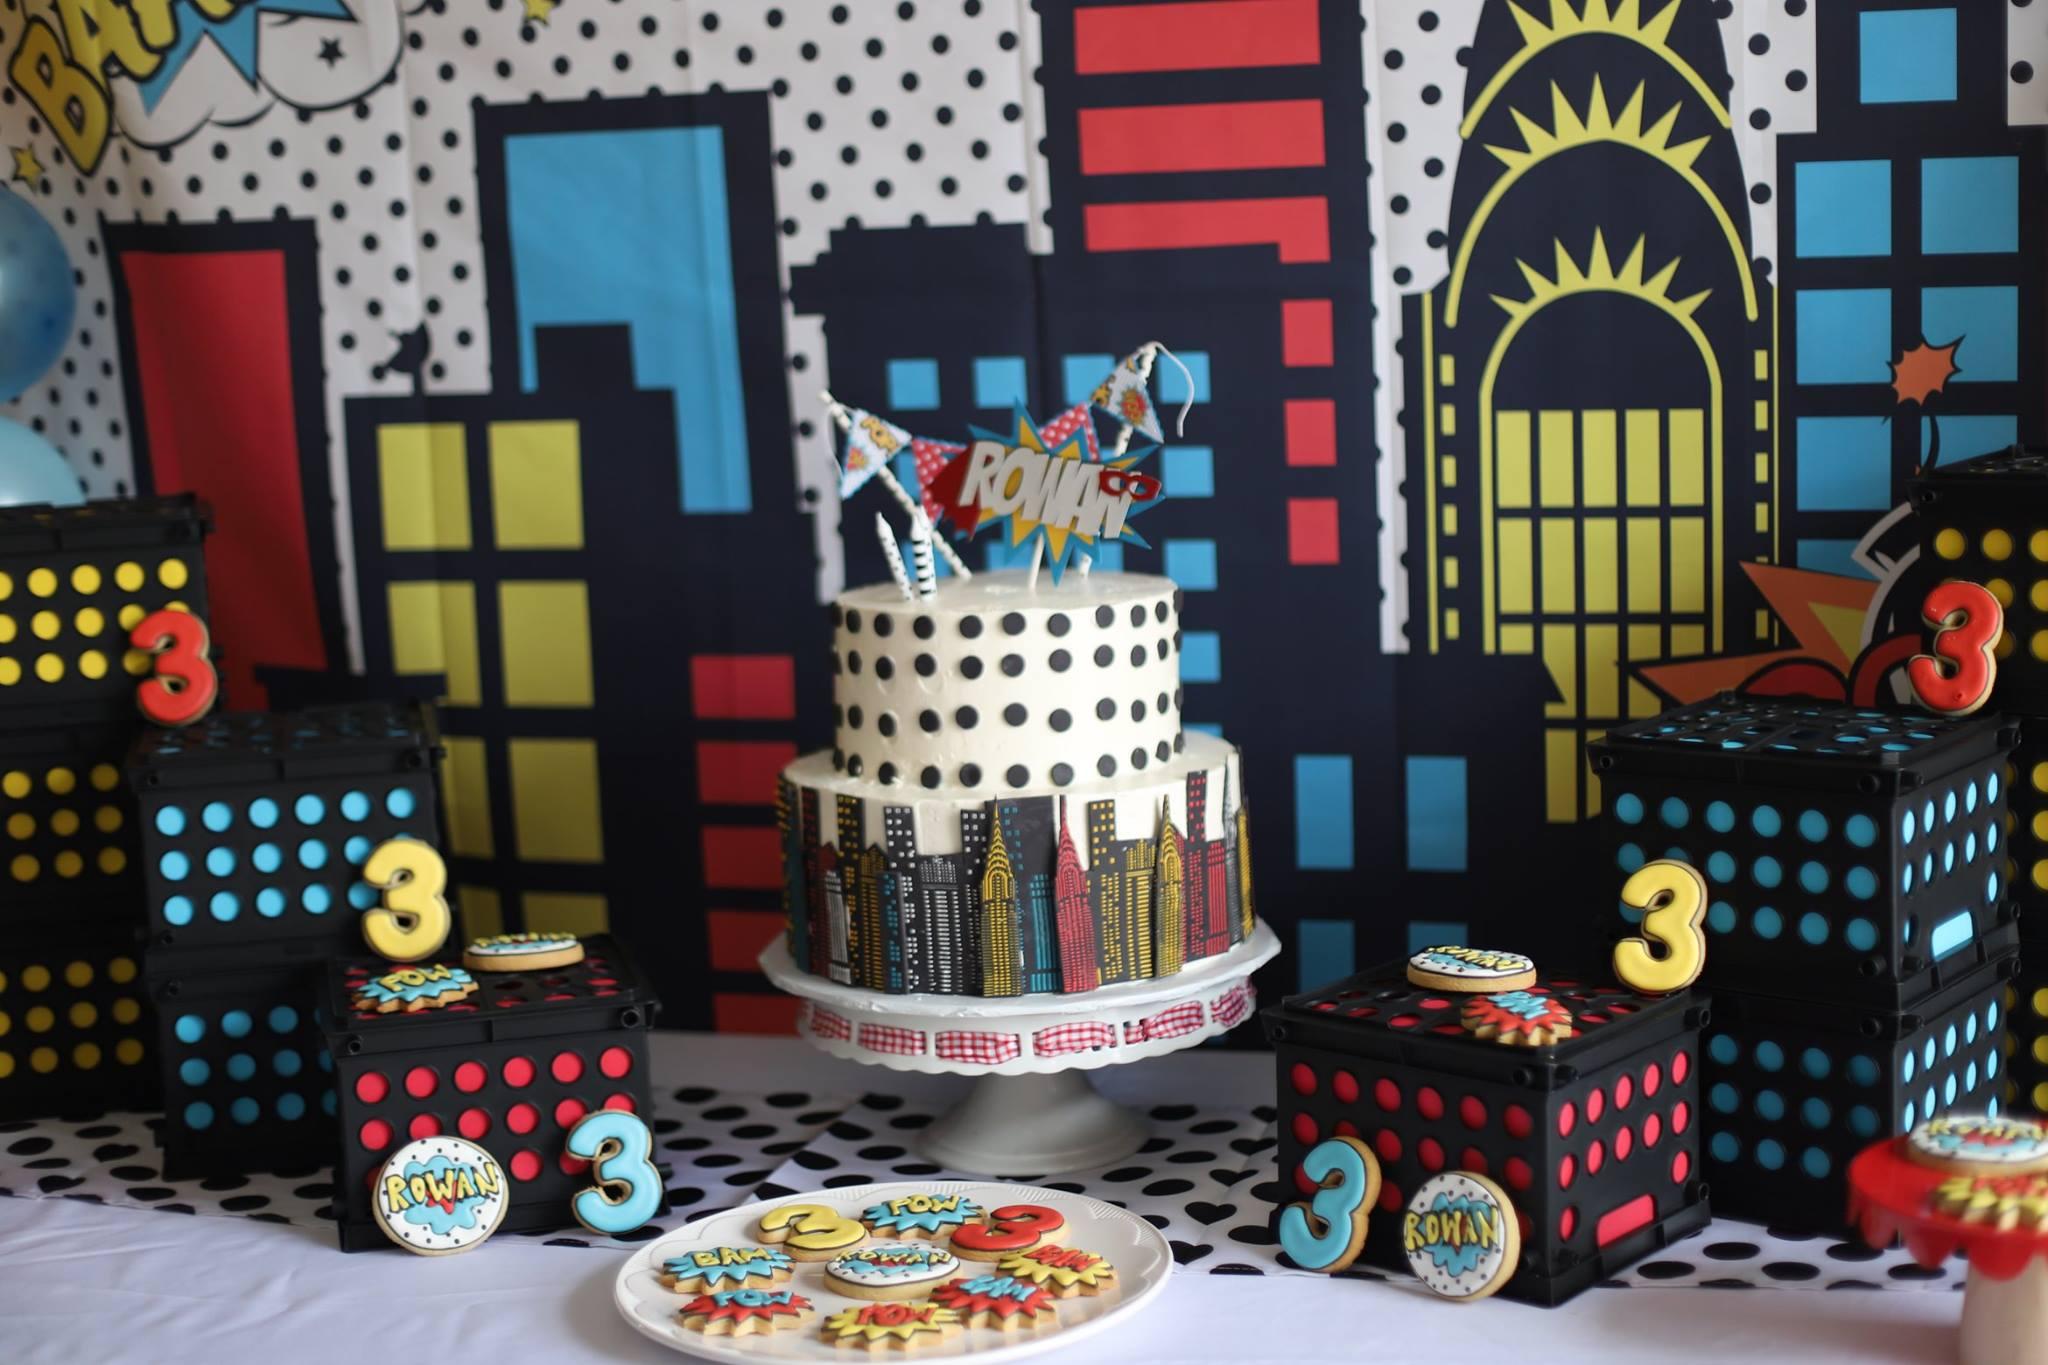 030_superhero_party_cake_and_cookies.jpg